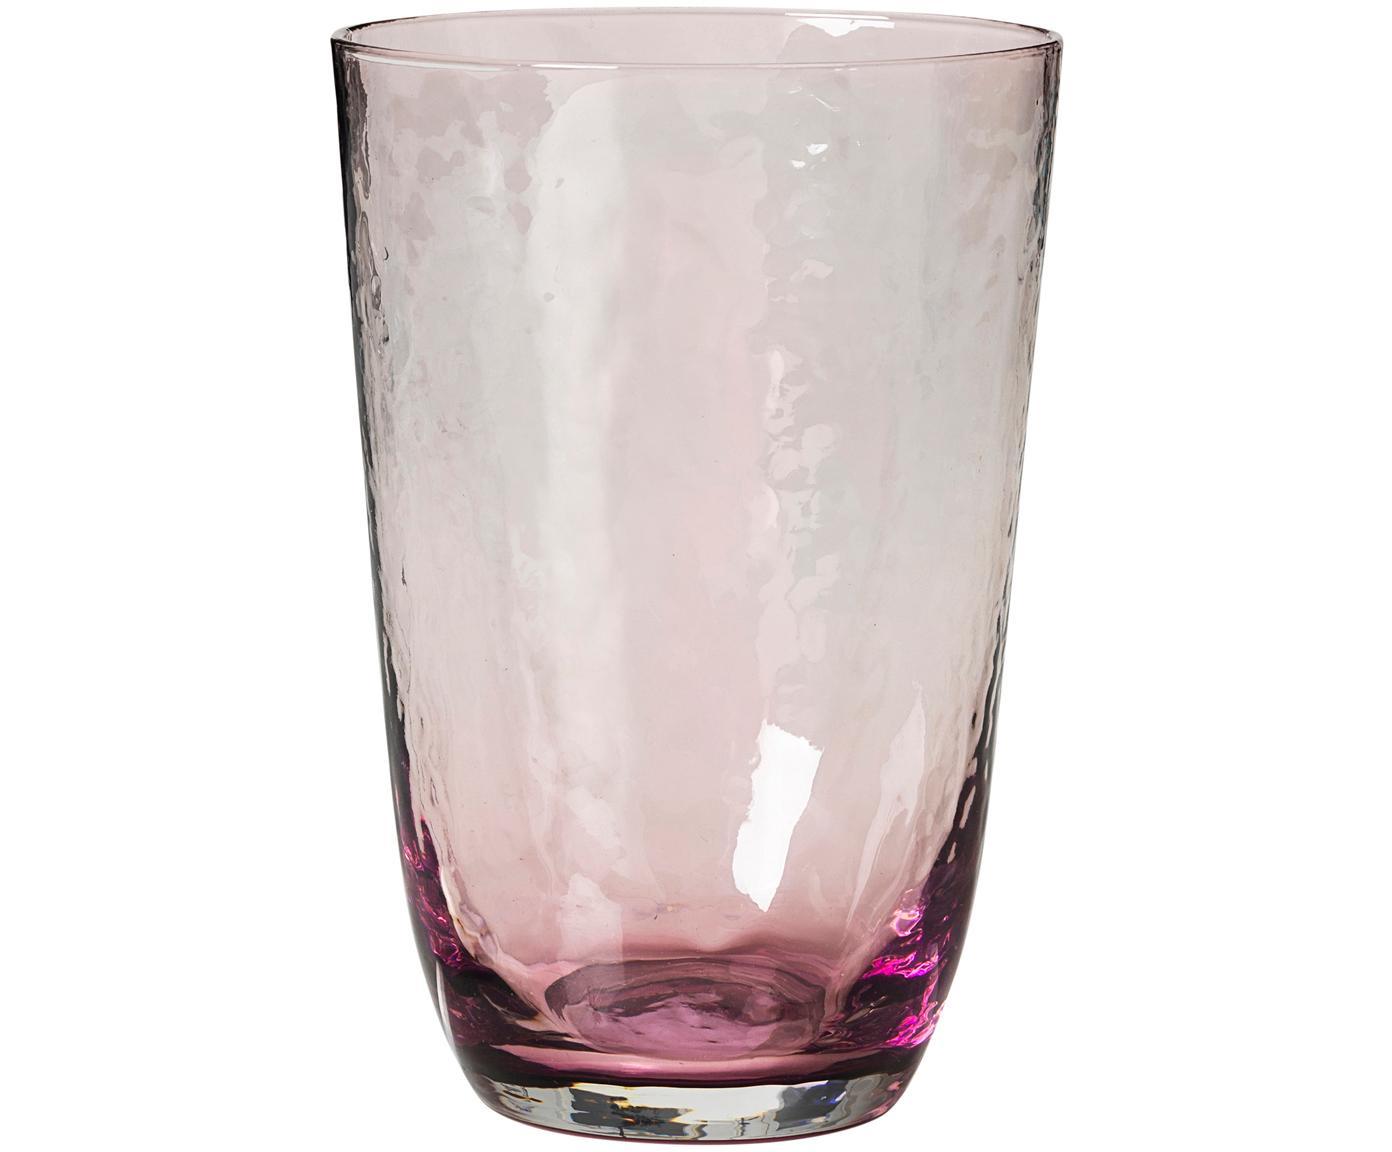 Vasos de vidrio soplado Hammered, 4uds., Vidrio soplado, Lila, transparente, Ø 9 x Al 14 cm